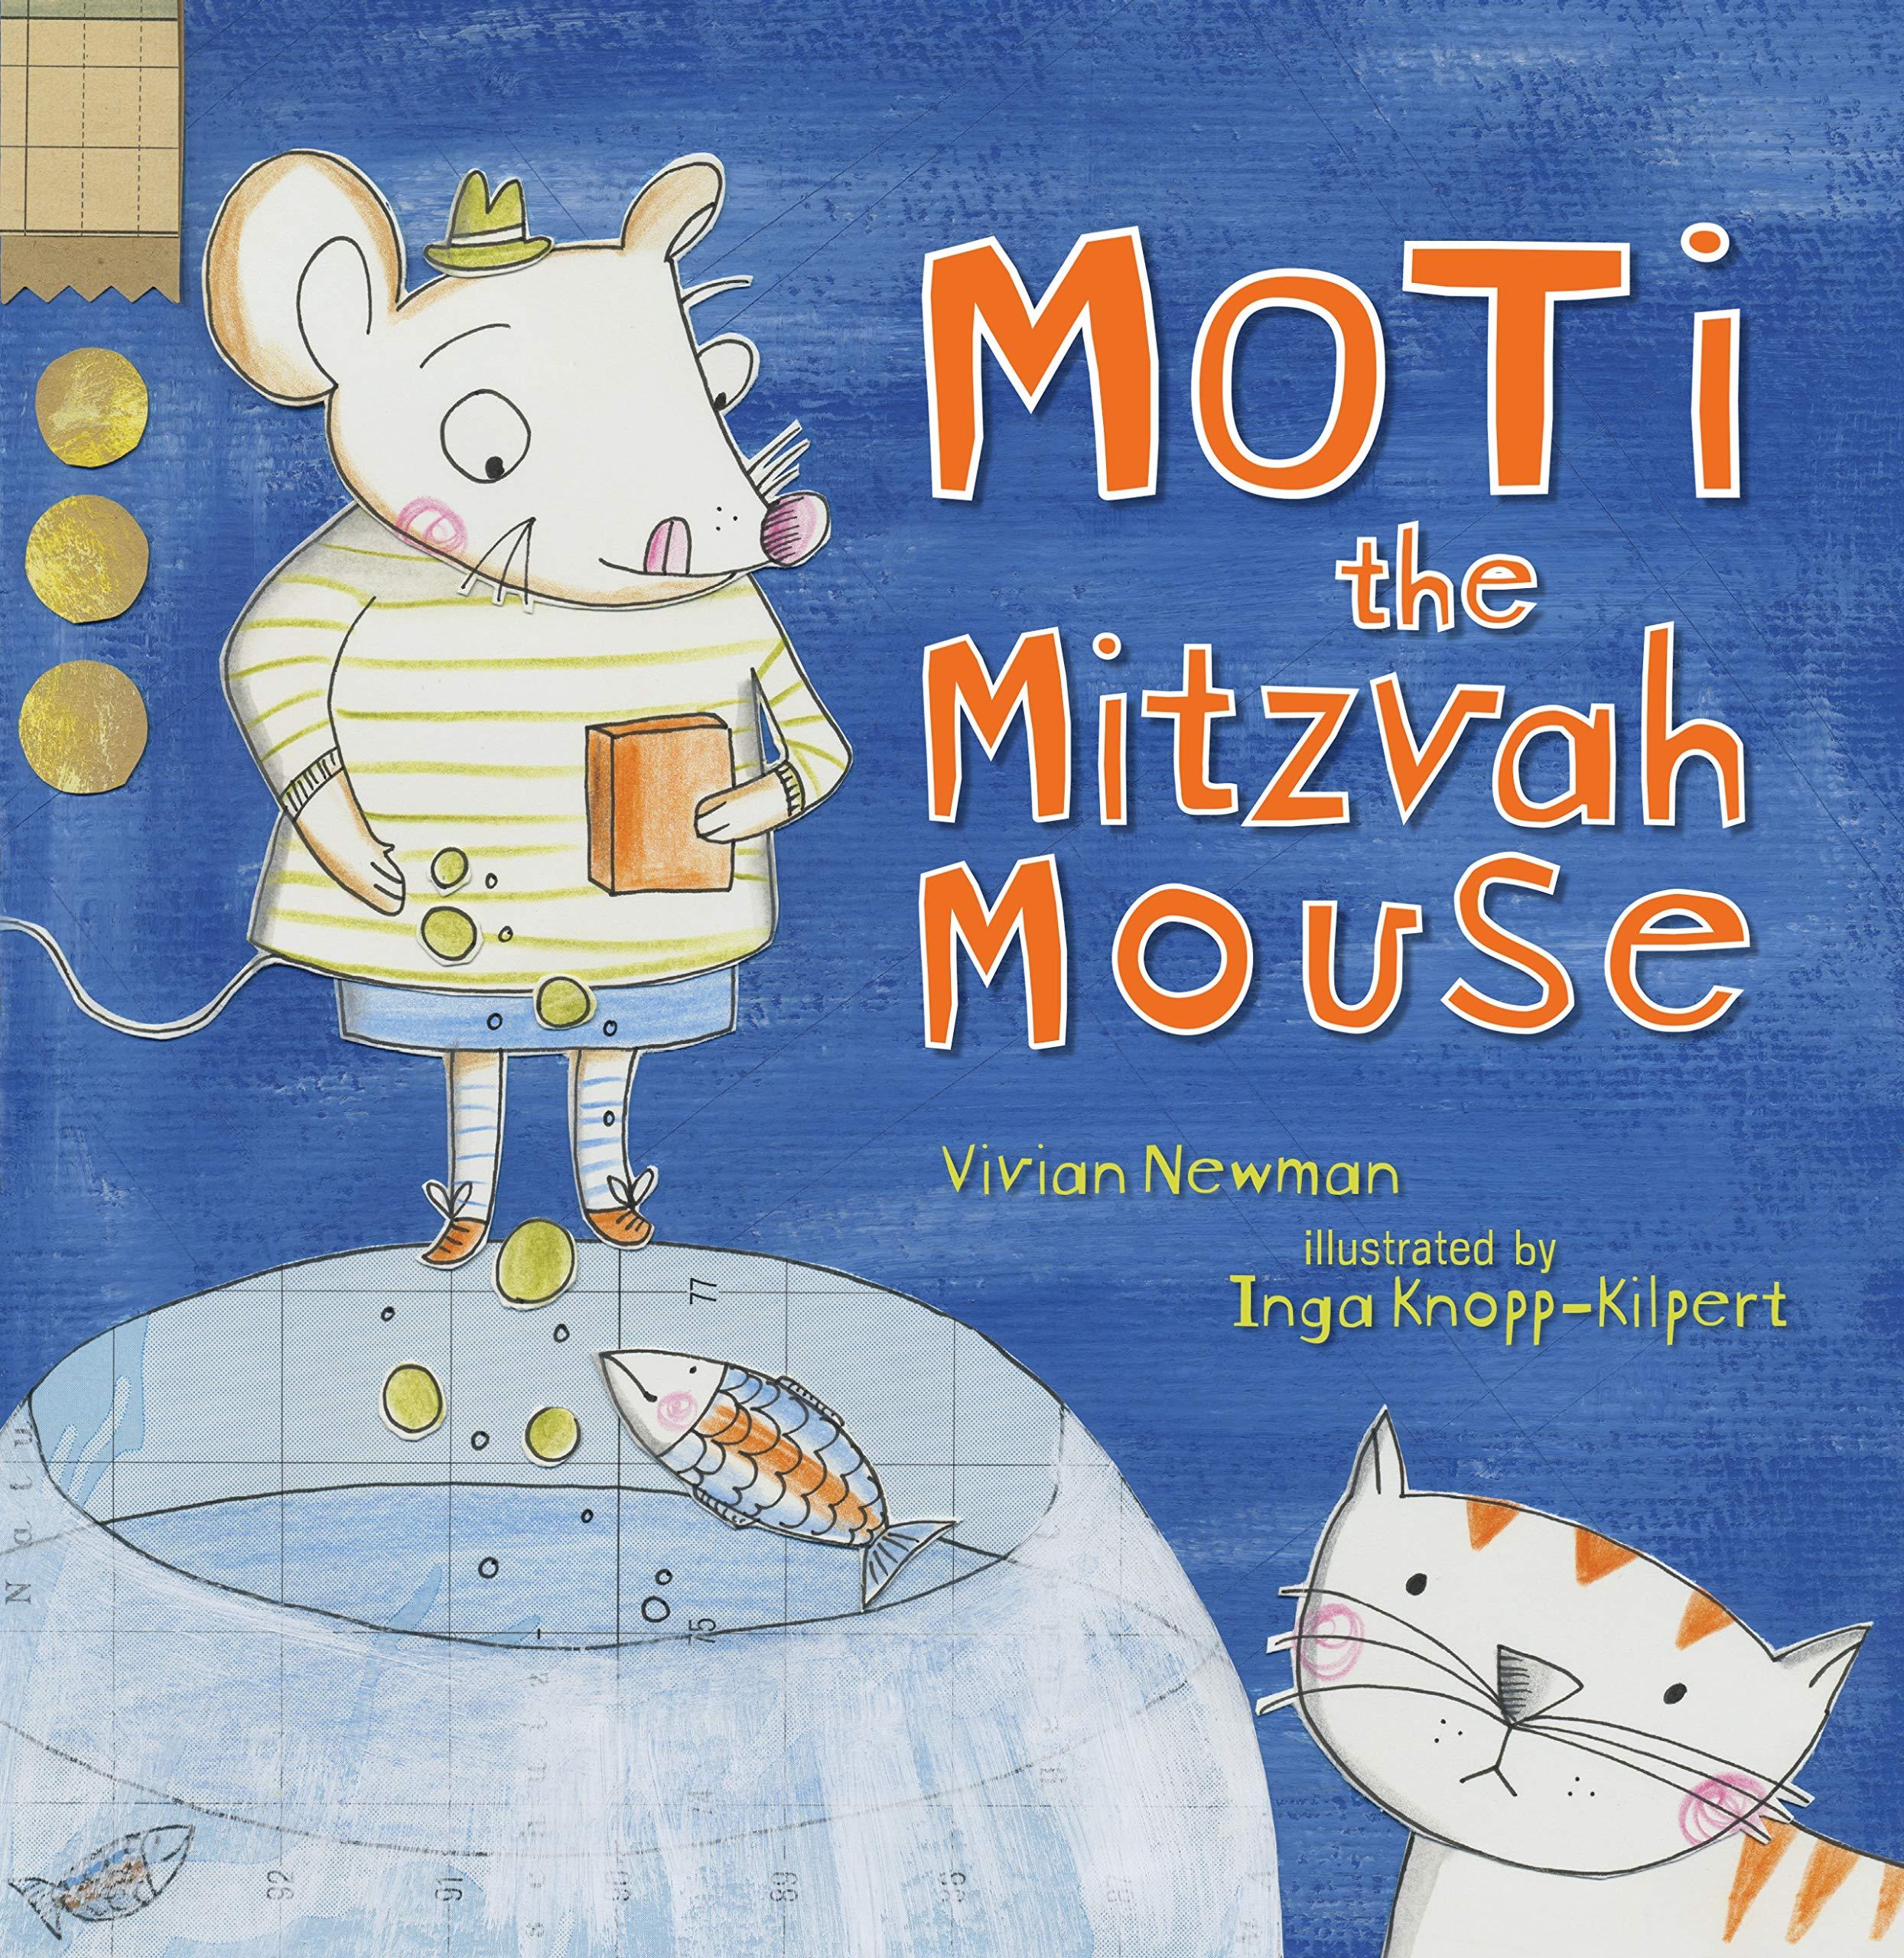 Moti The Mitzvah Mouse Vivian Bonnie Newman Inga Knopp